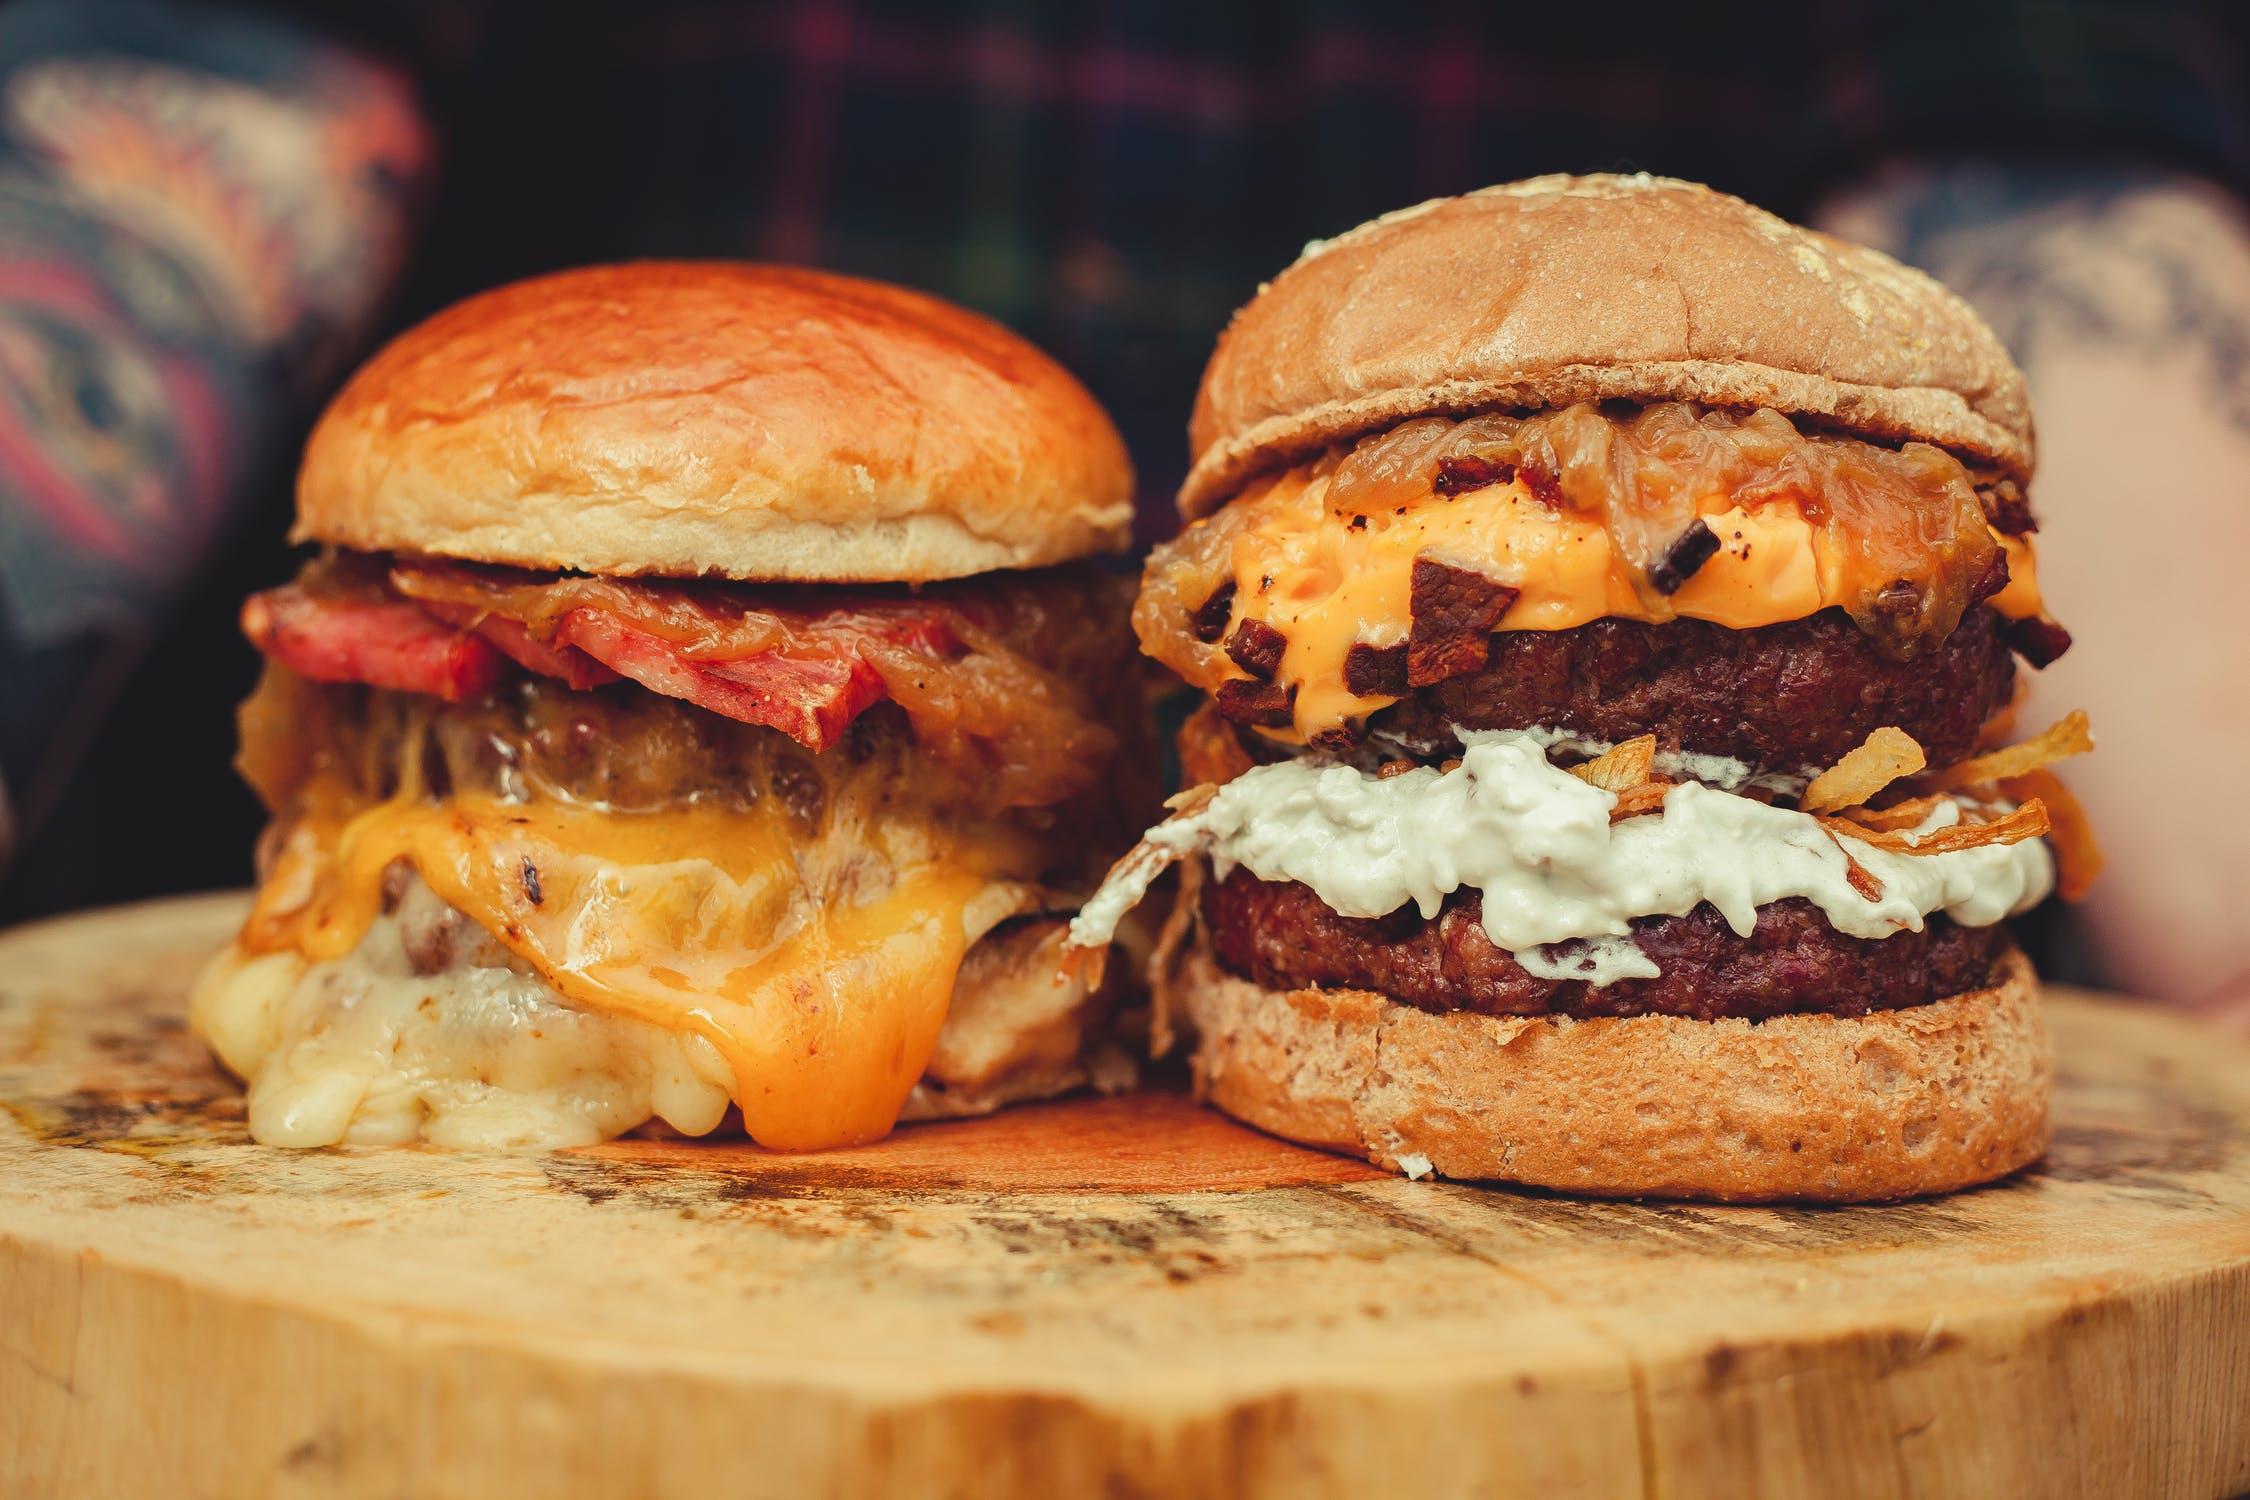 Share A Double Burger Deal